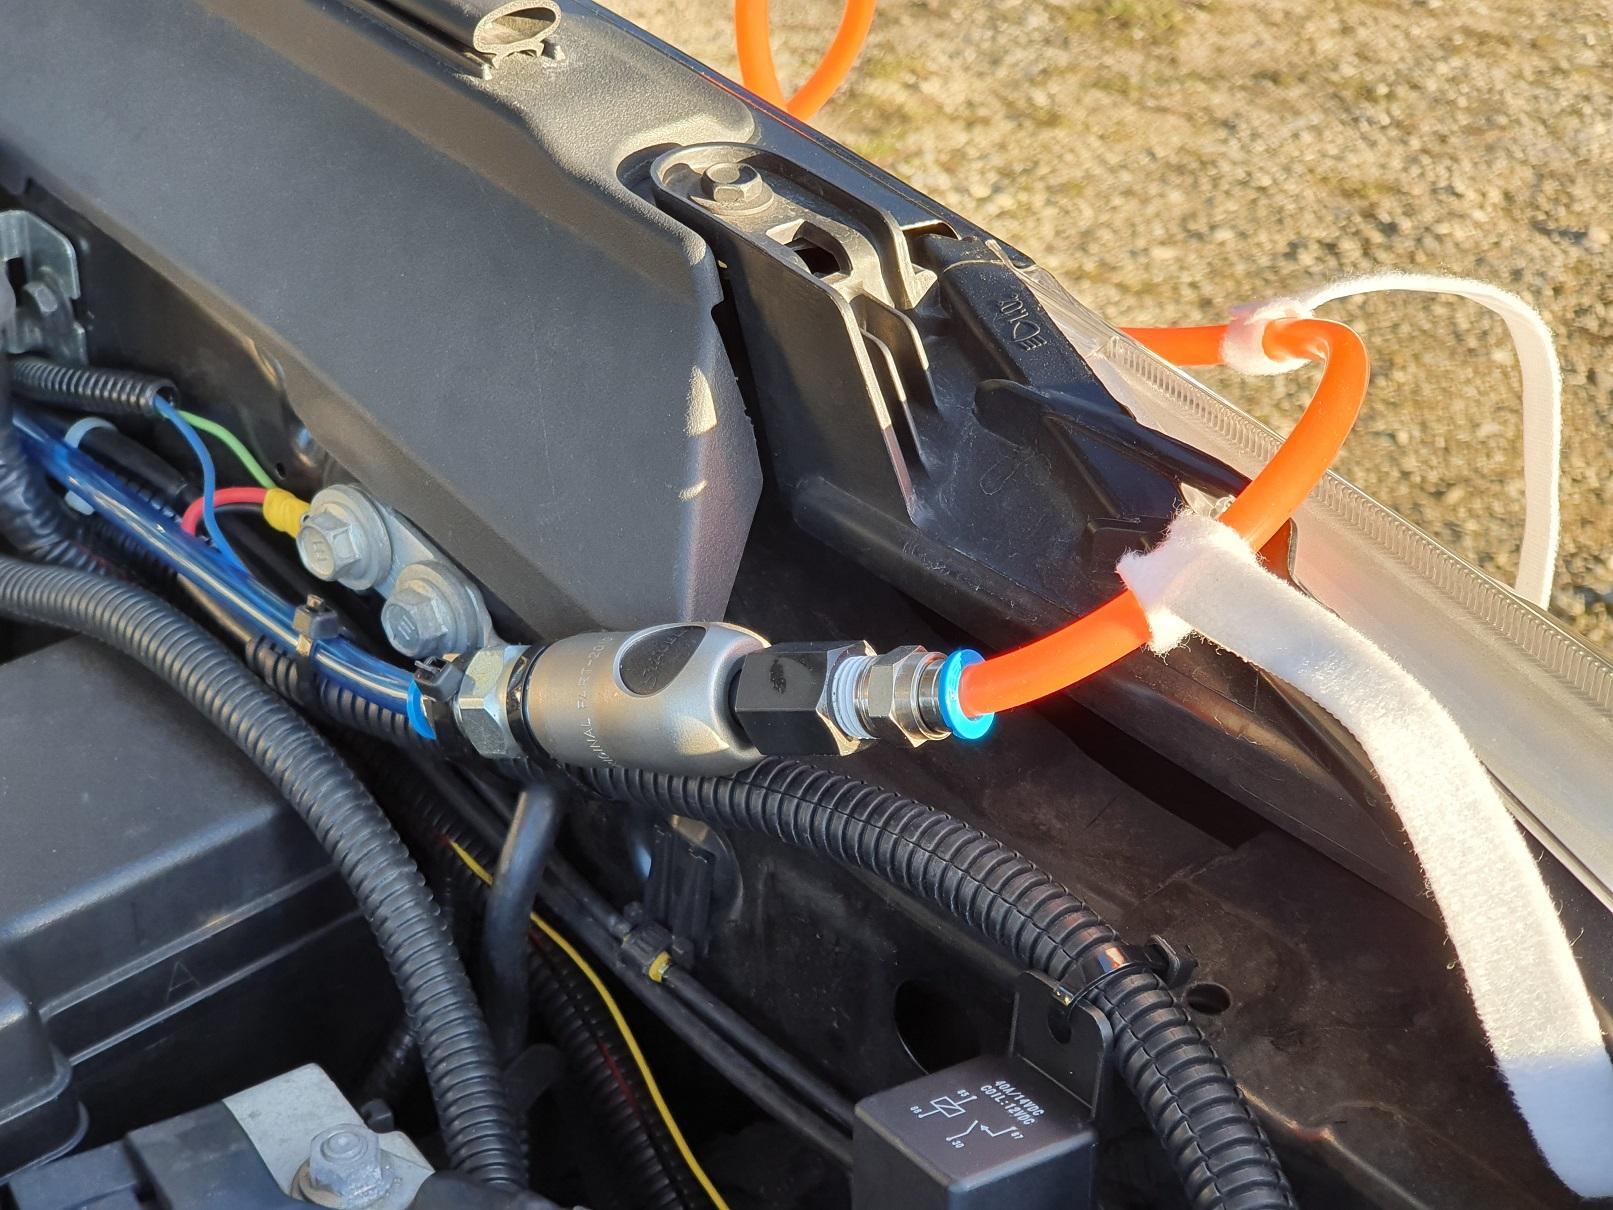 offroad ARB Kompressor CKMA12 Festmontage 75L/Min 4x4 overland Toyota Hilux overland expedition